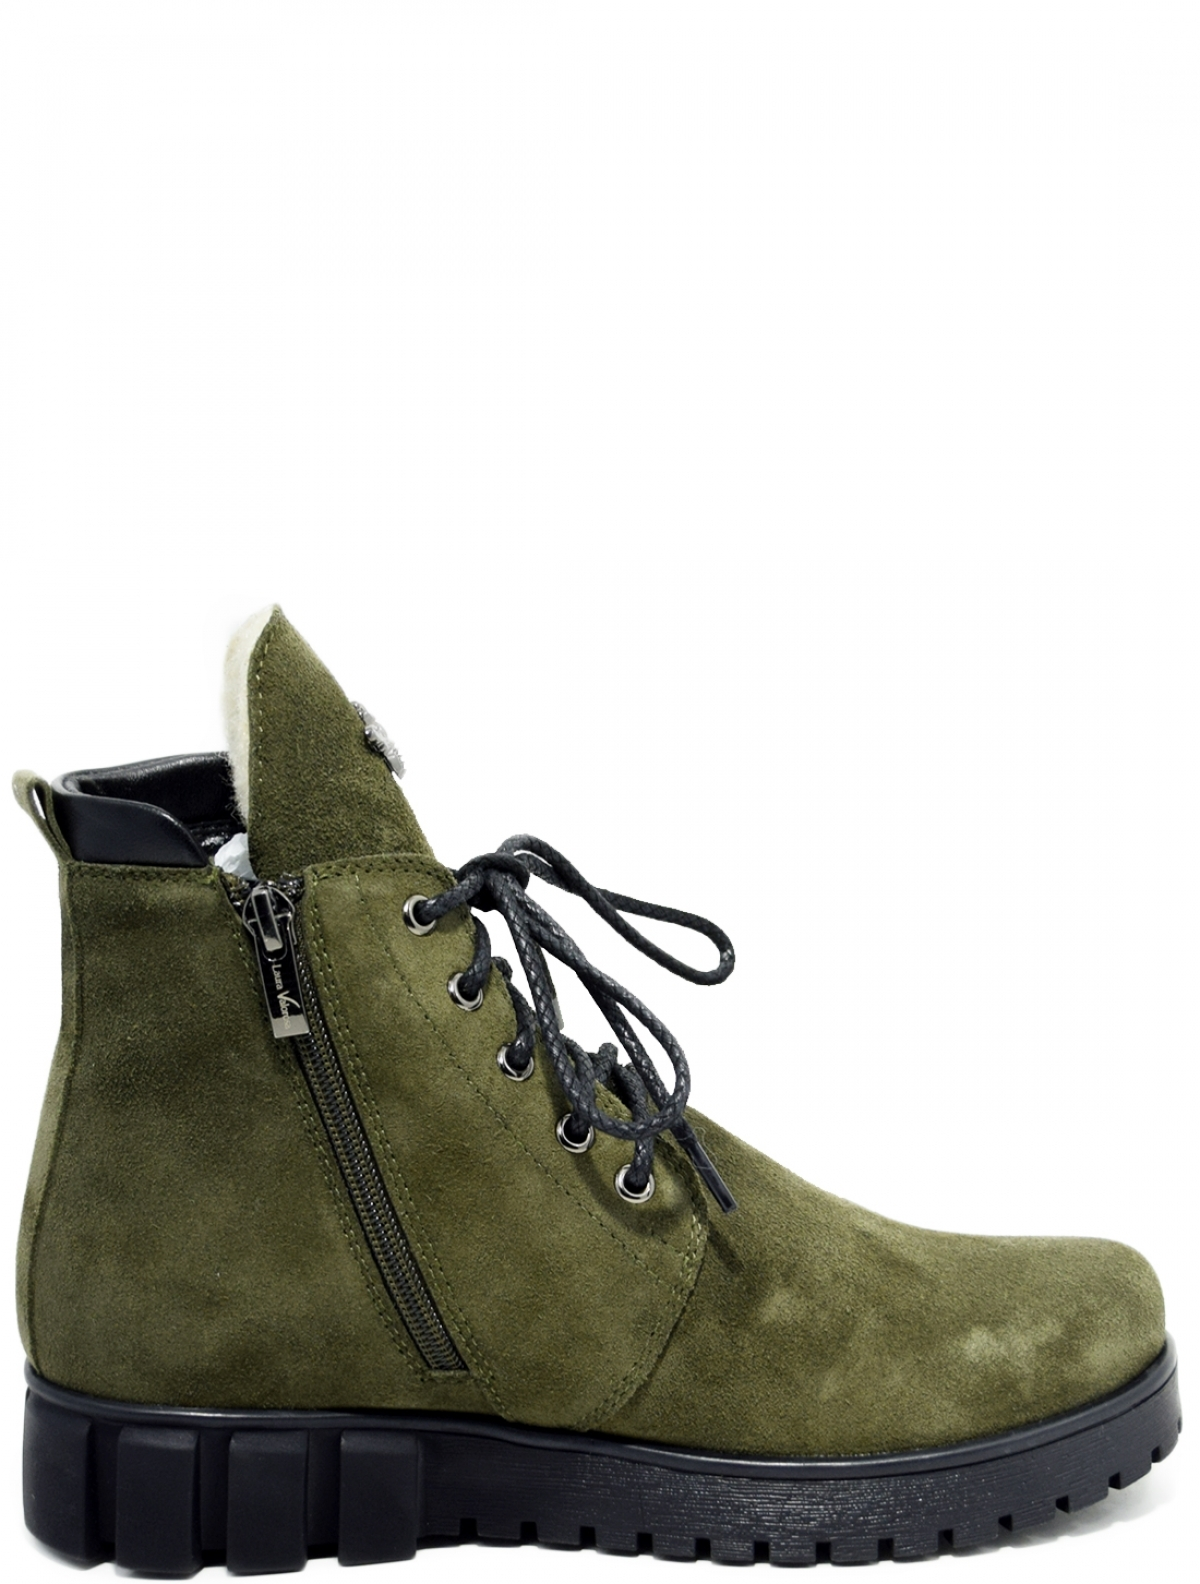 Selm 1842-64/7 женские ботинки